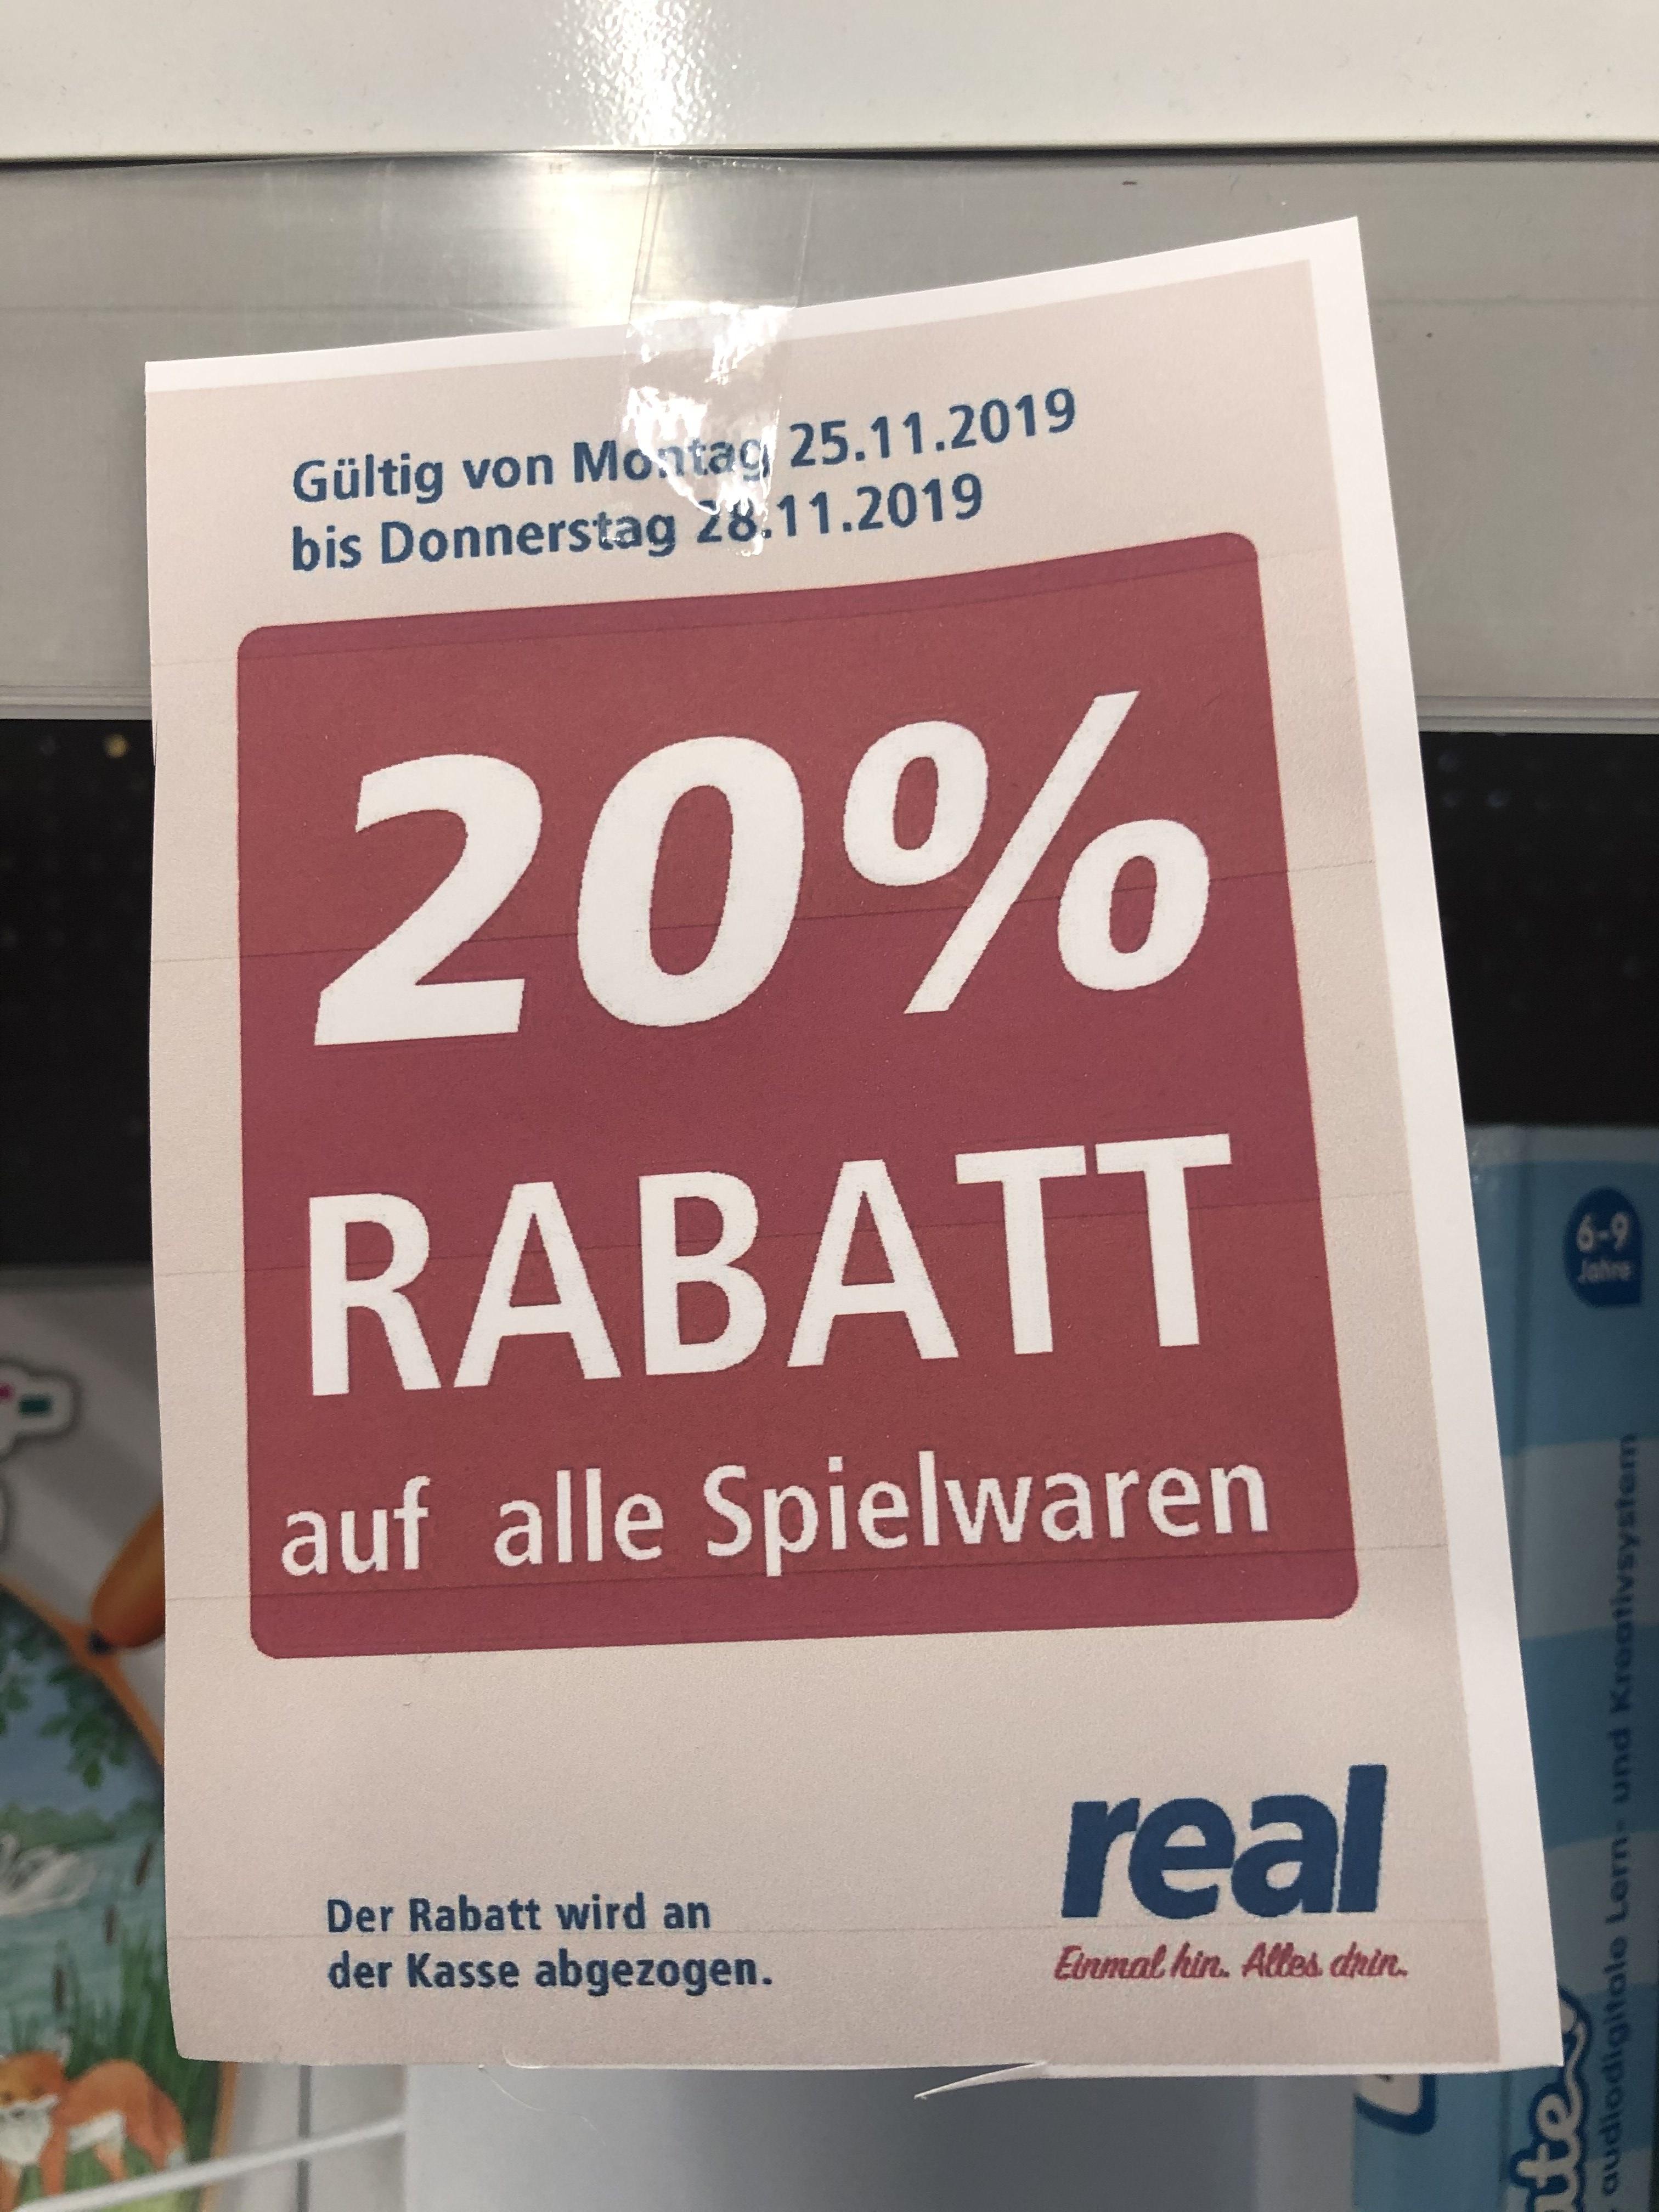 Real - 20% auf alle Spielwaren in Bocholt [Lokal]